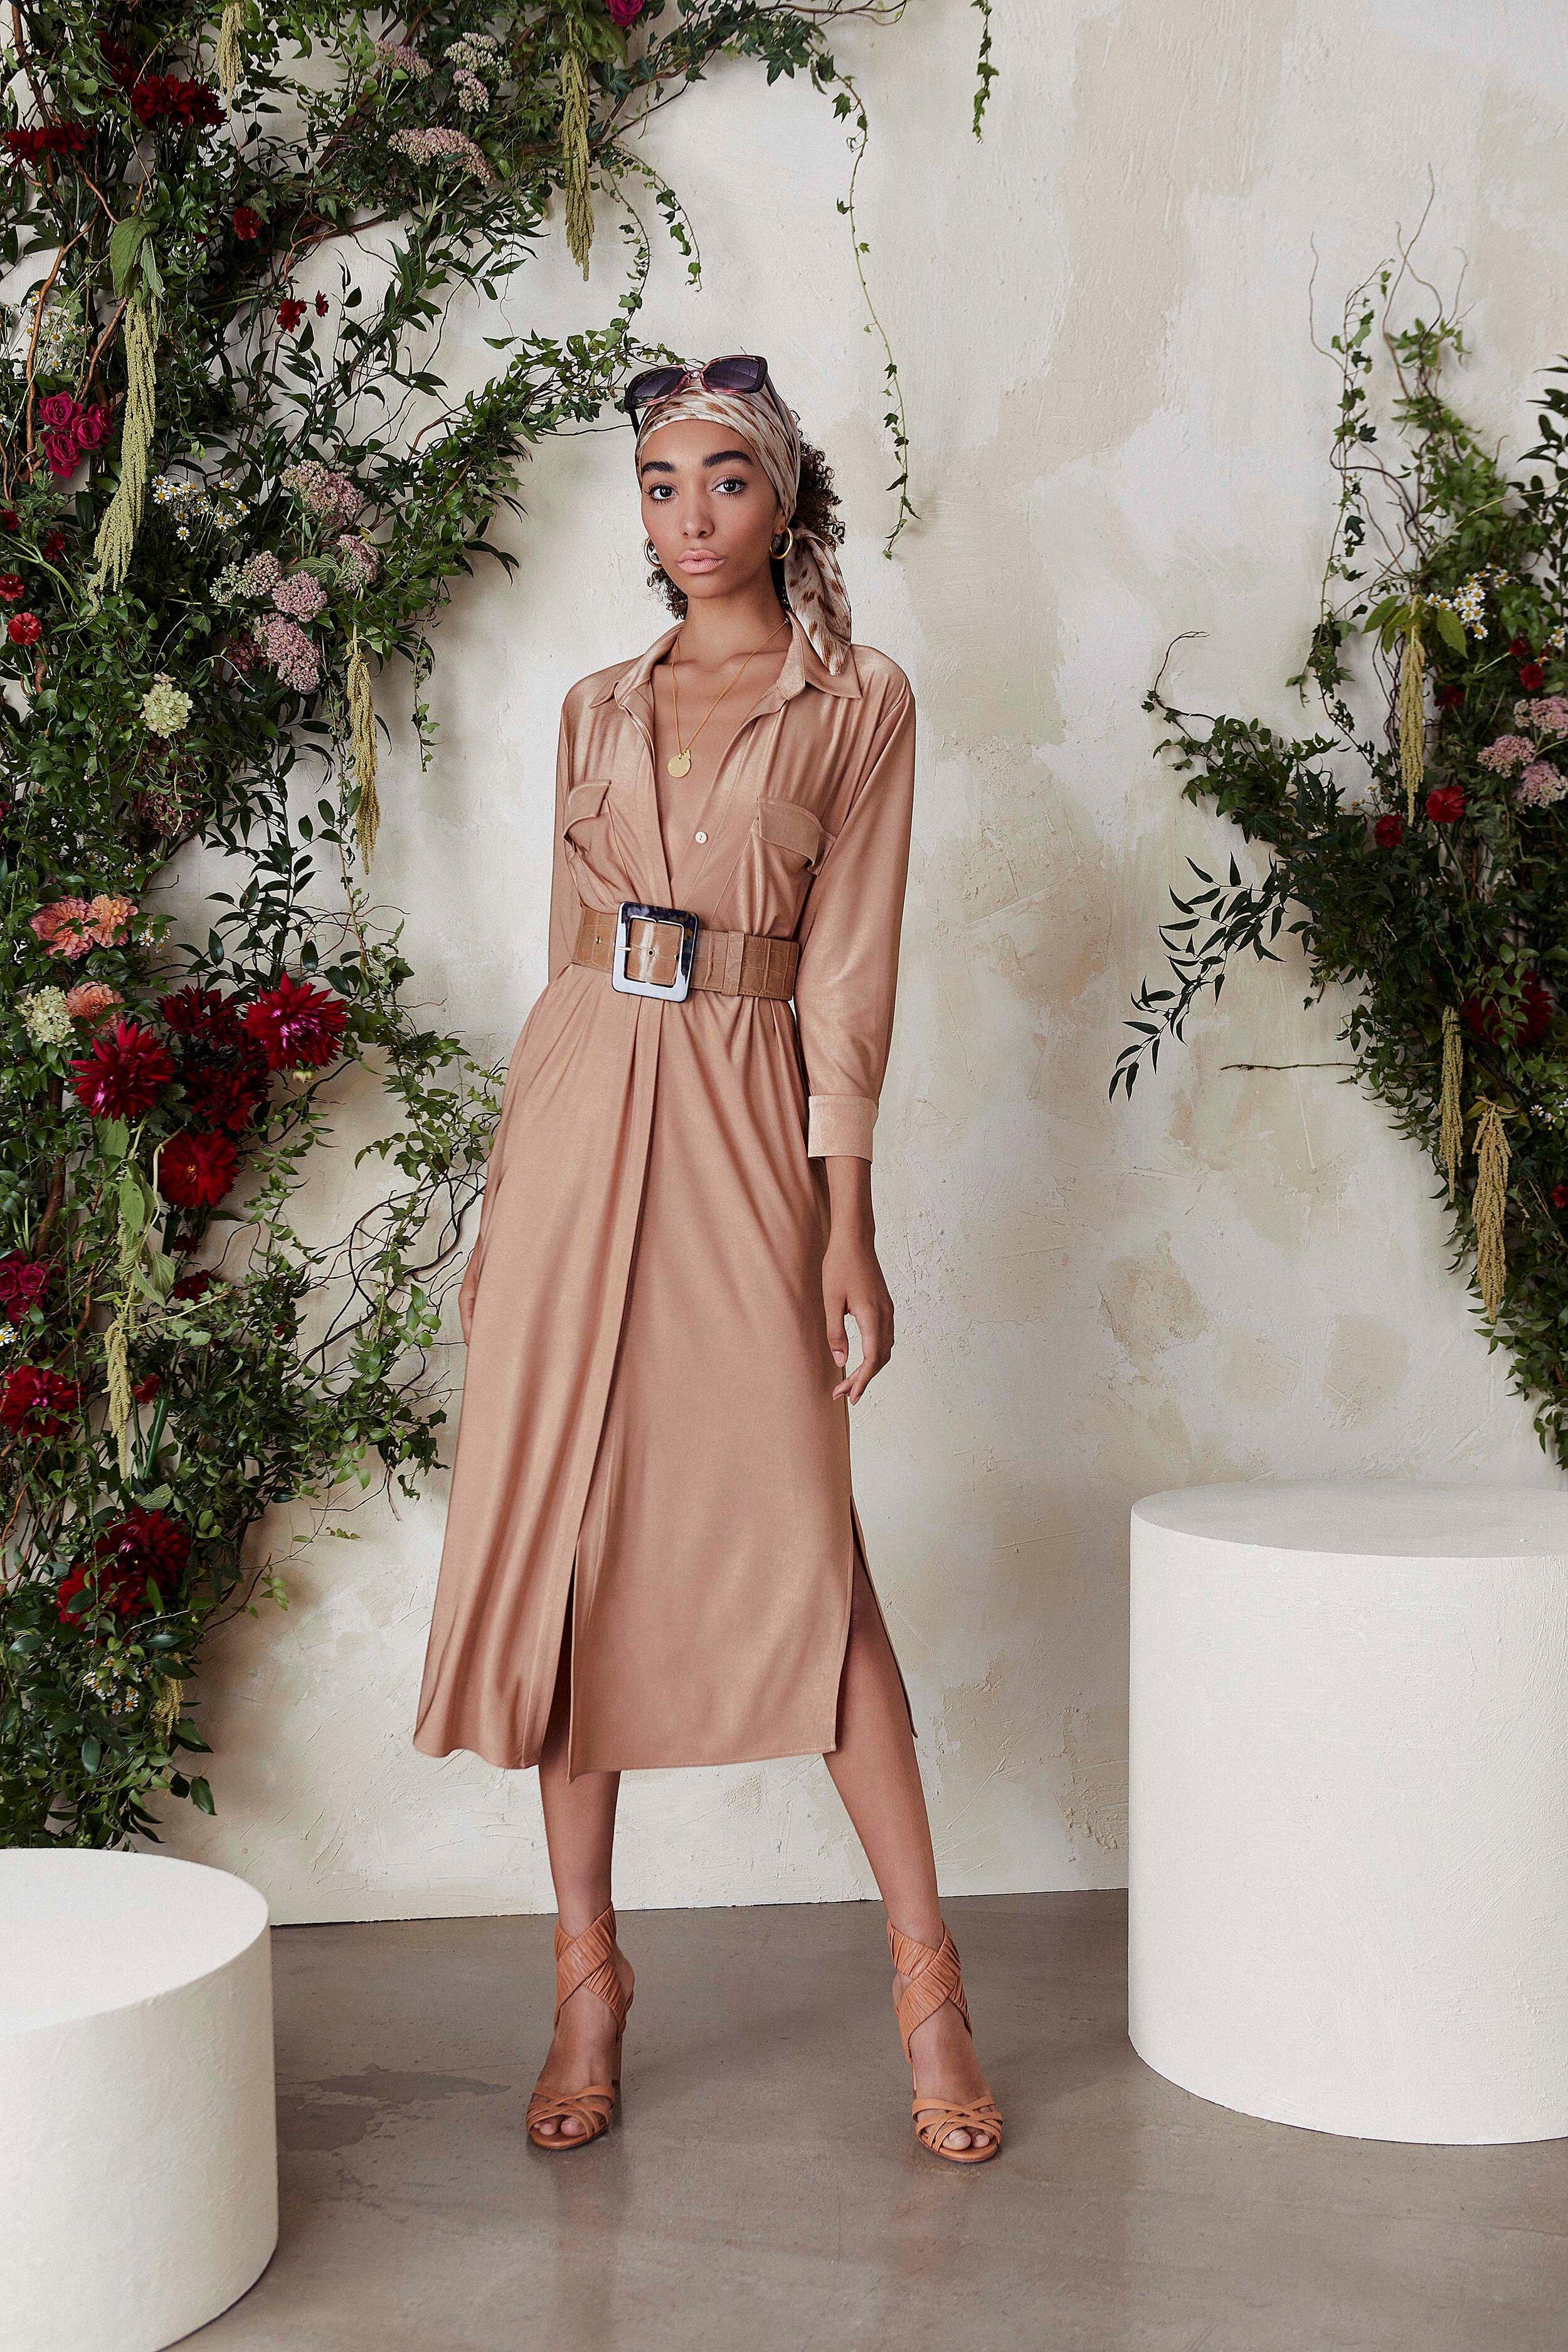 L'Agence S/S 2020 - Vogue